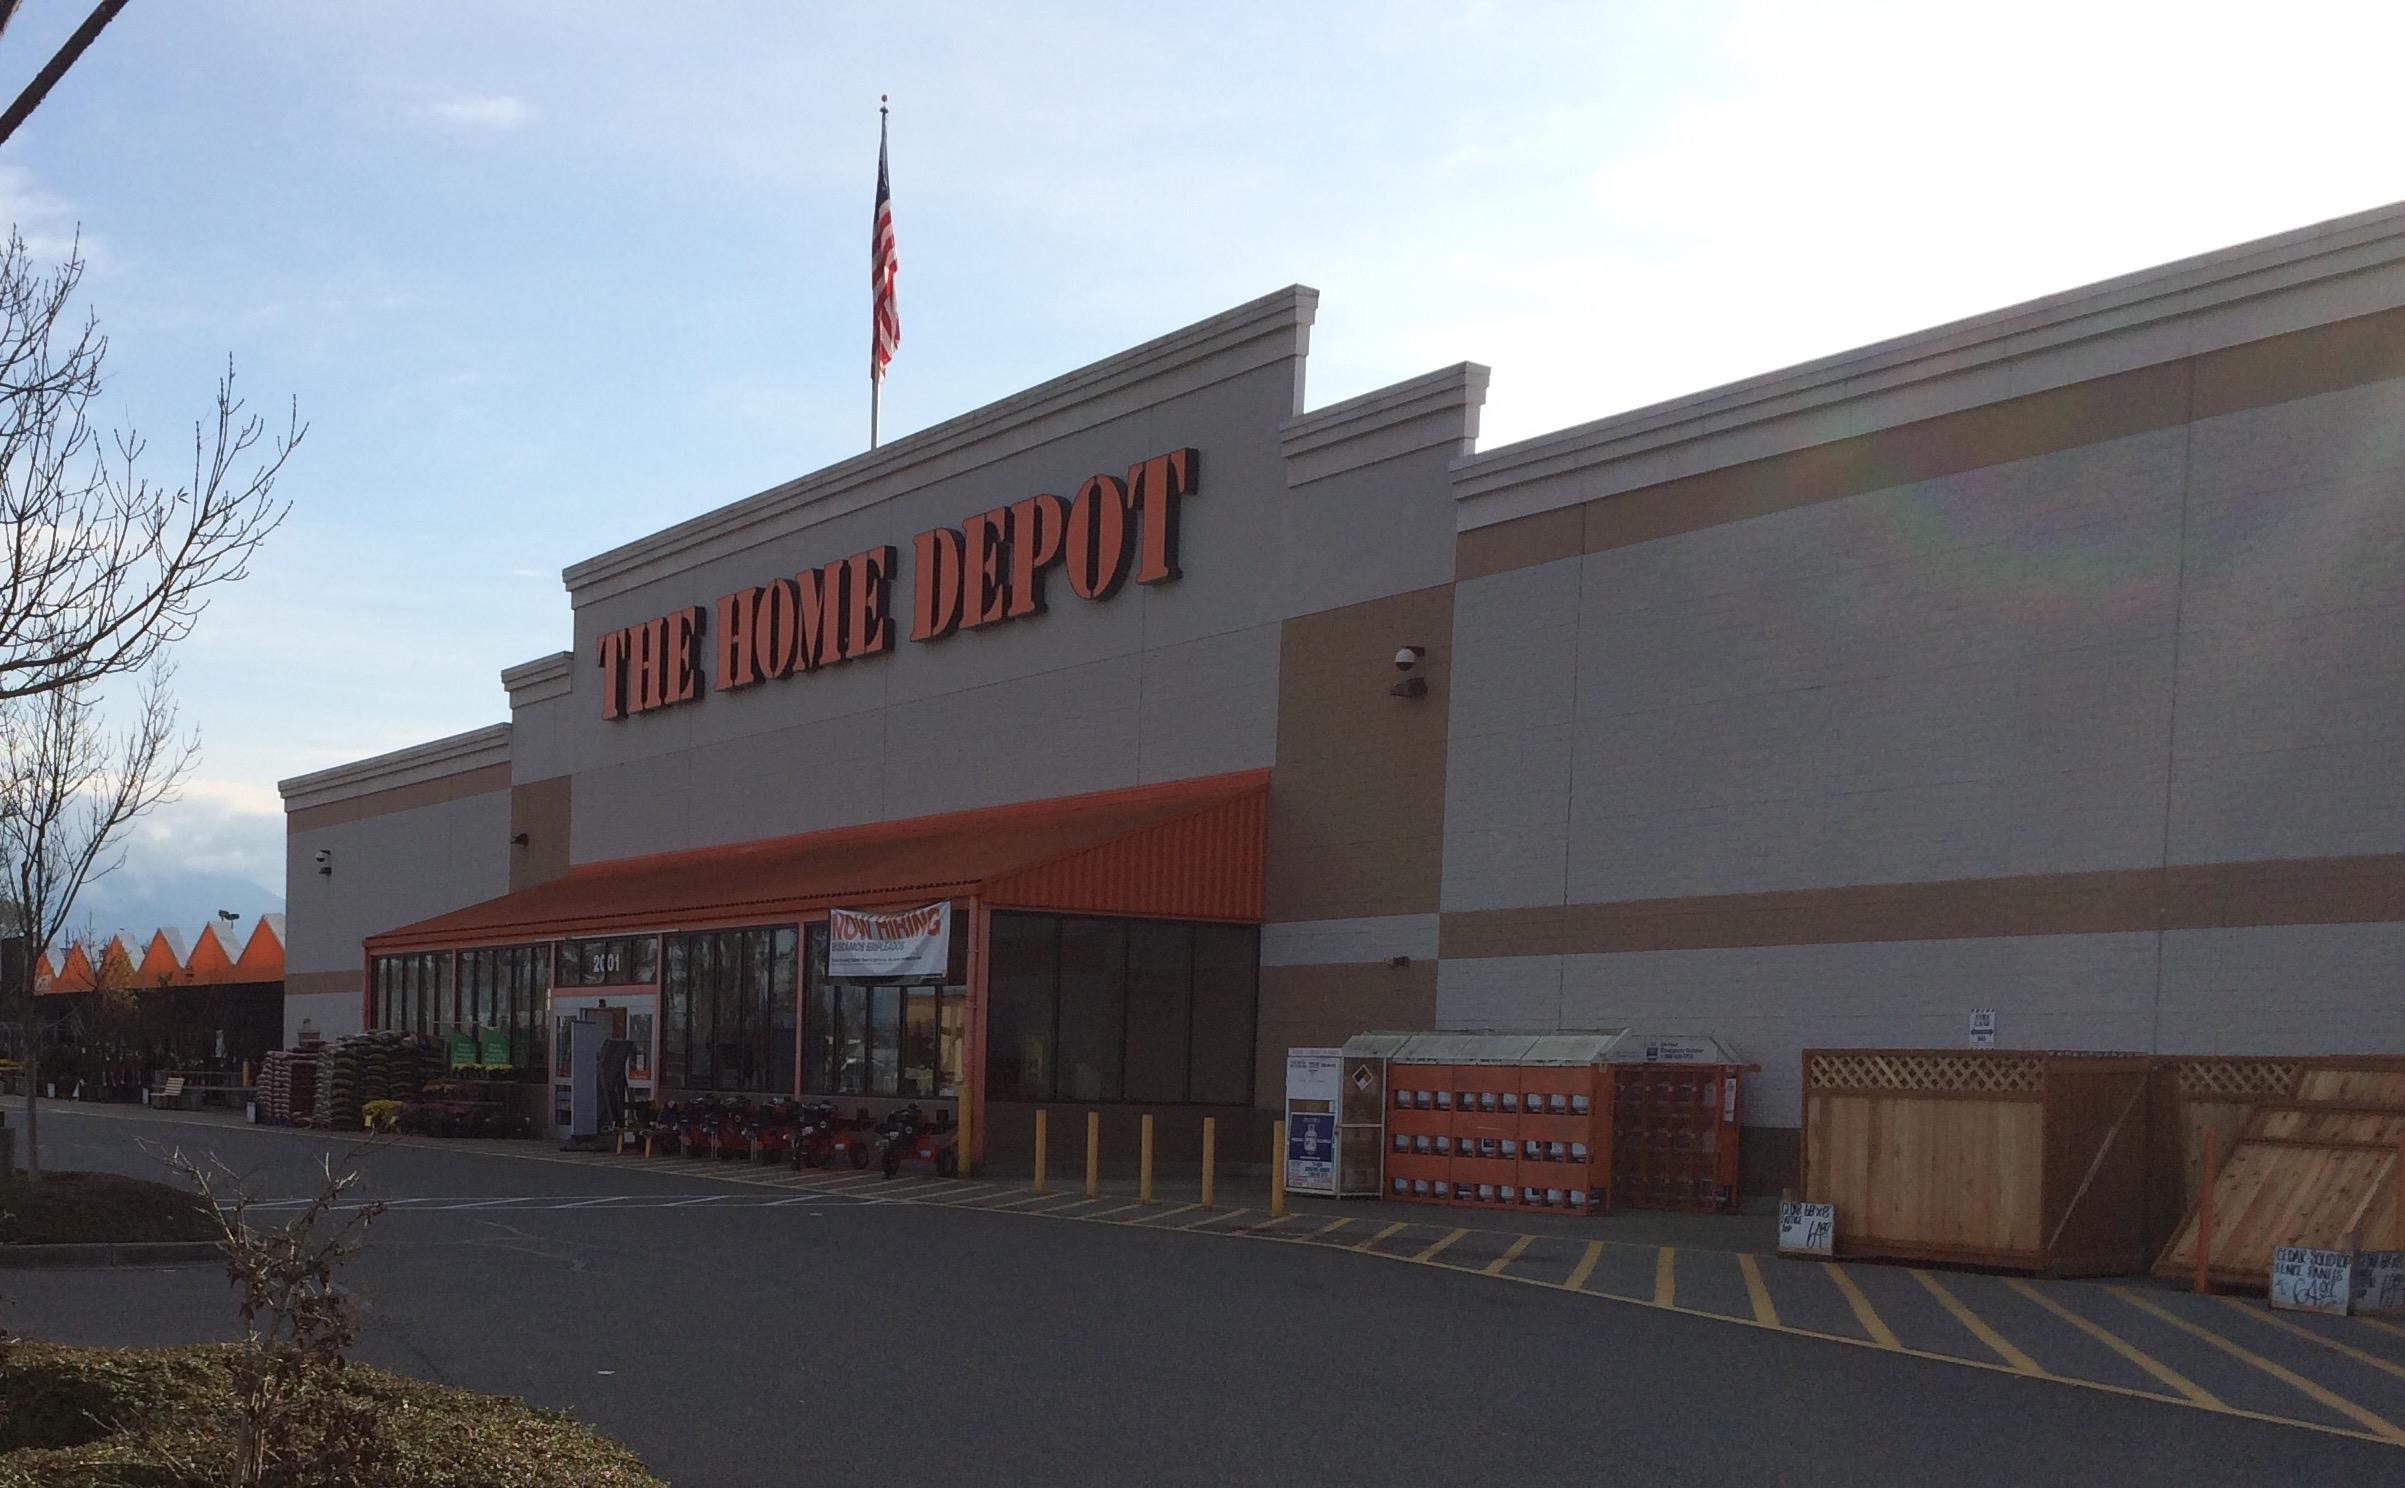 Burlington Hours Today Near Me >> The Home Depot Coupons Burlington WA near me | 8coupons